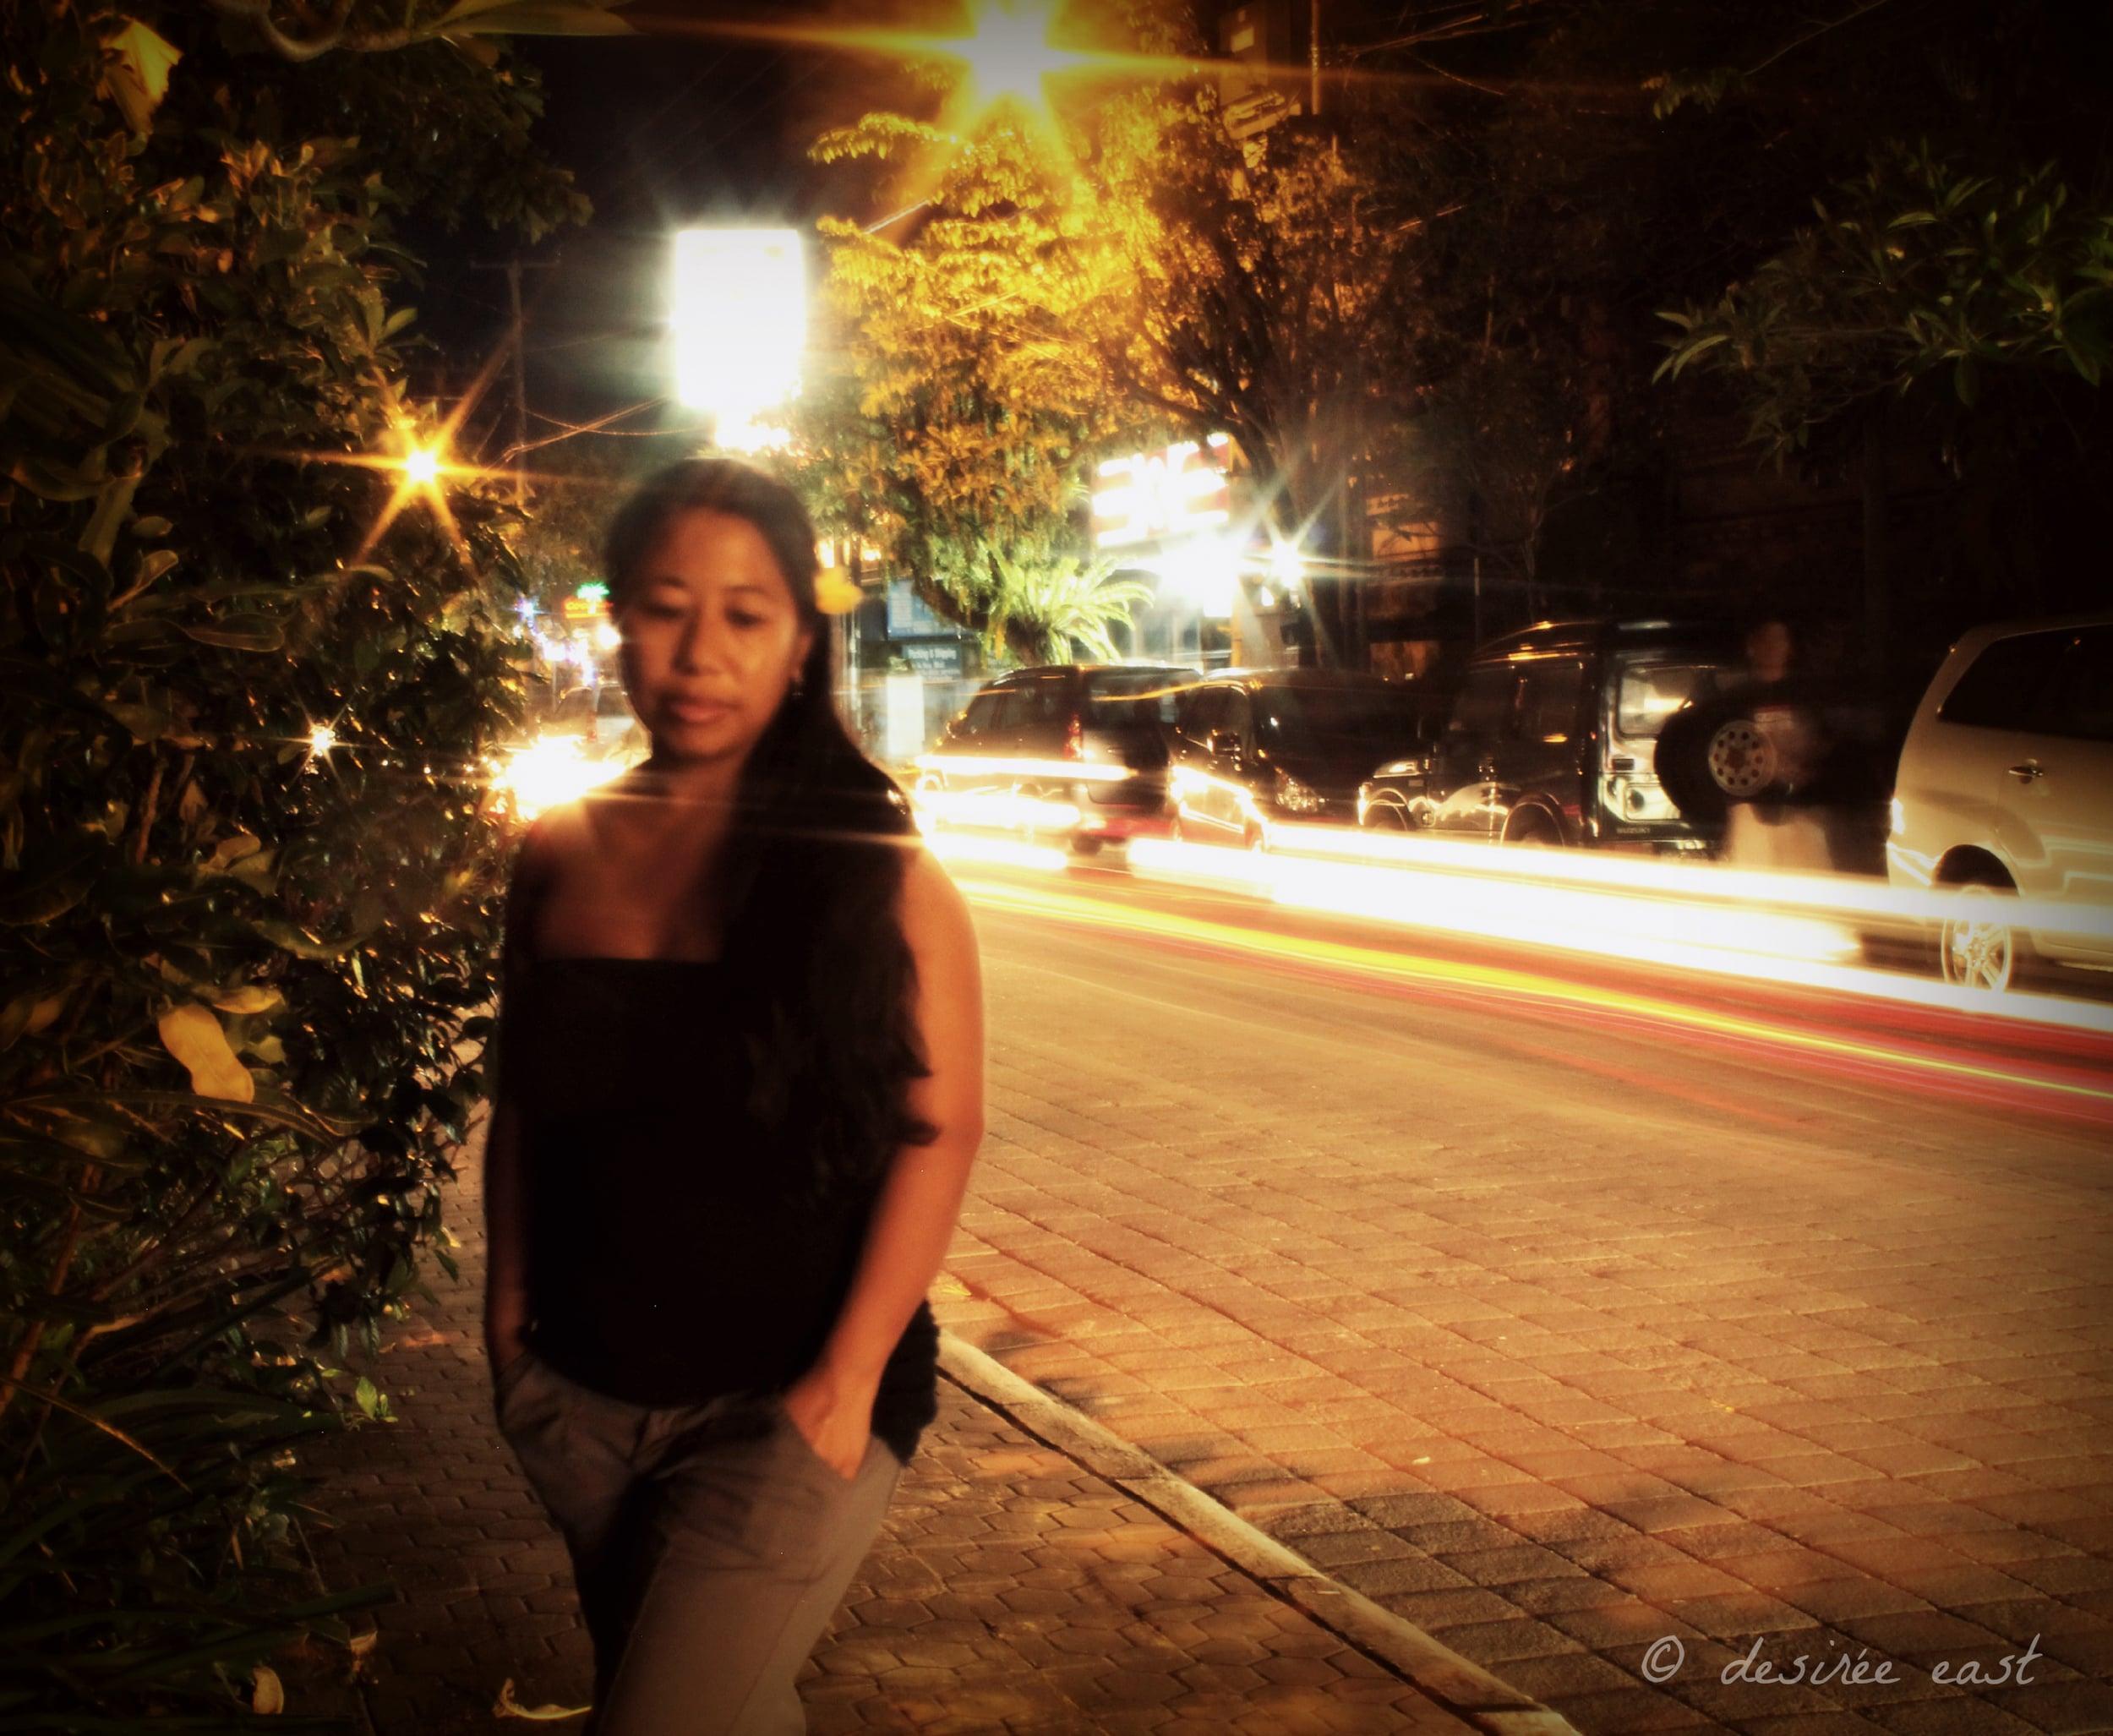 long exposure self-portrait. ubud, bali. photo by desiree east